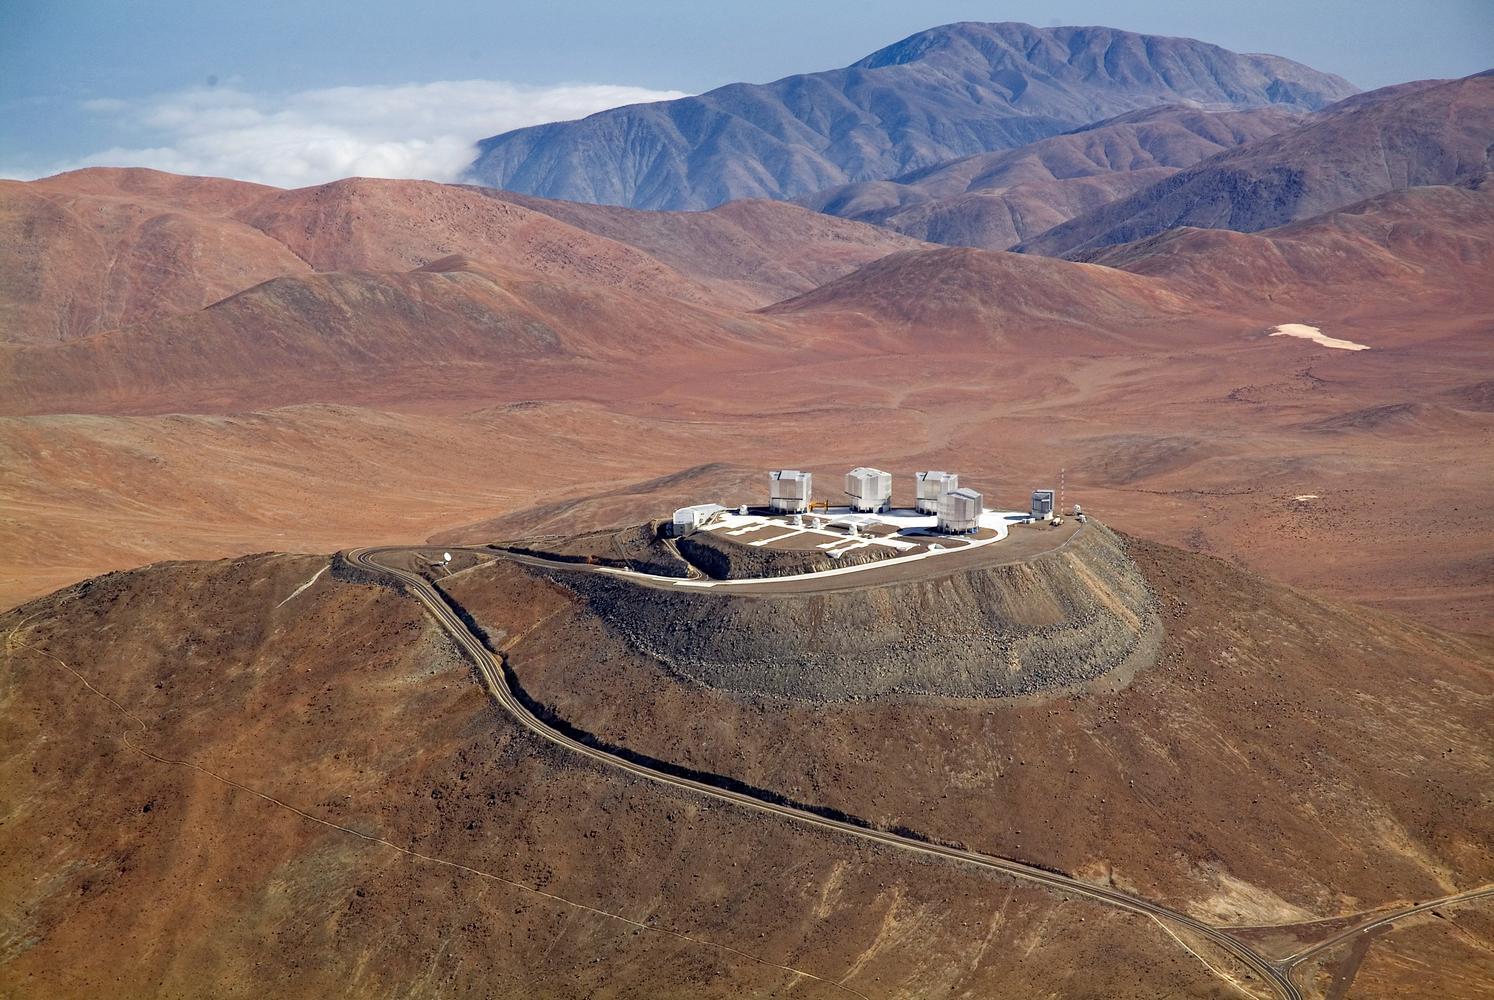 Very Large Telescopes (VLT) Cerro Paranal, Chile